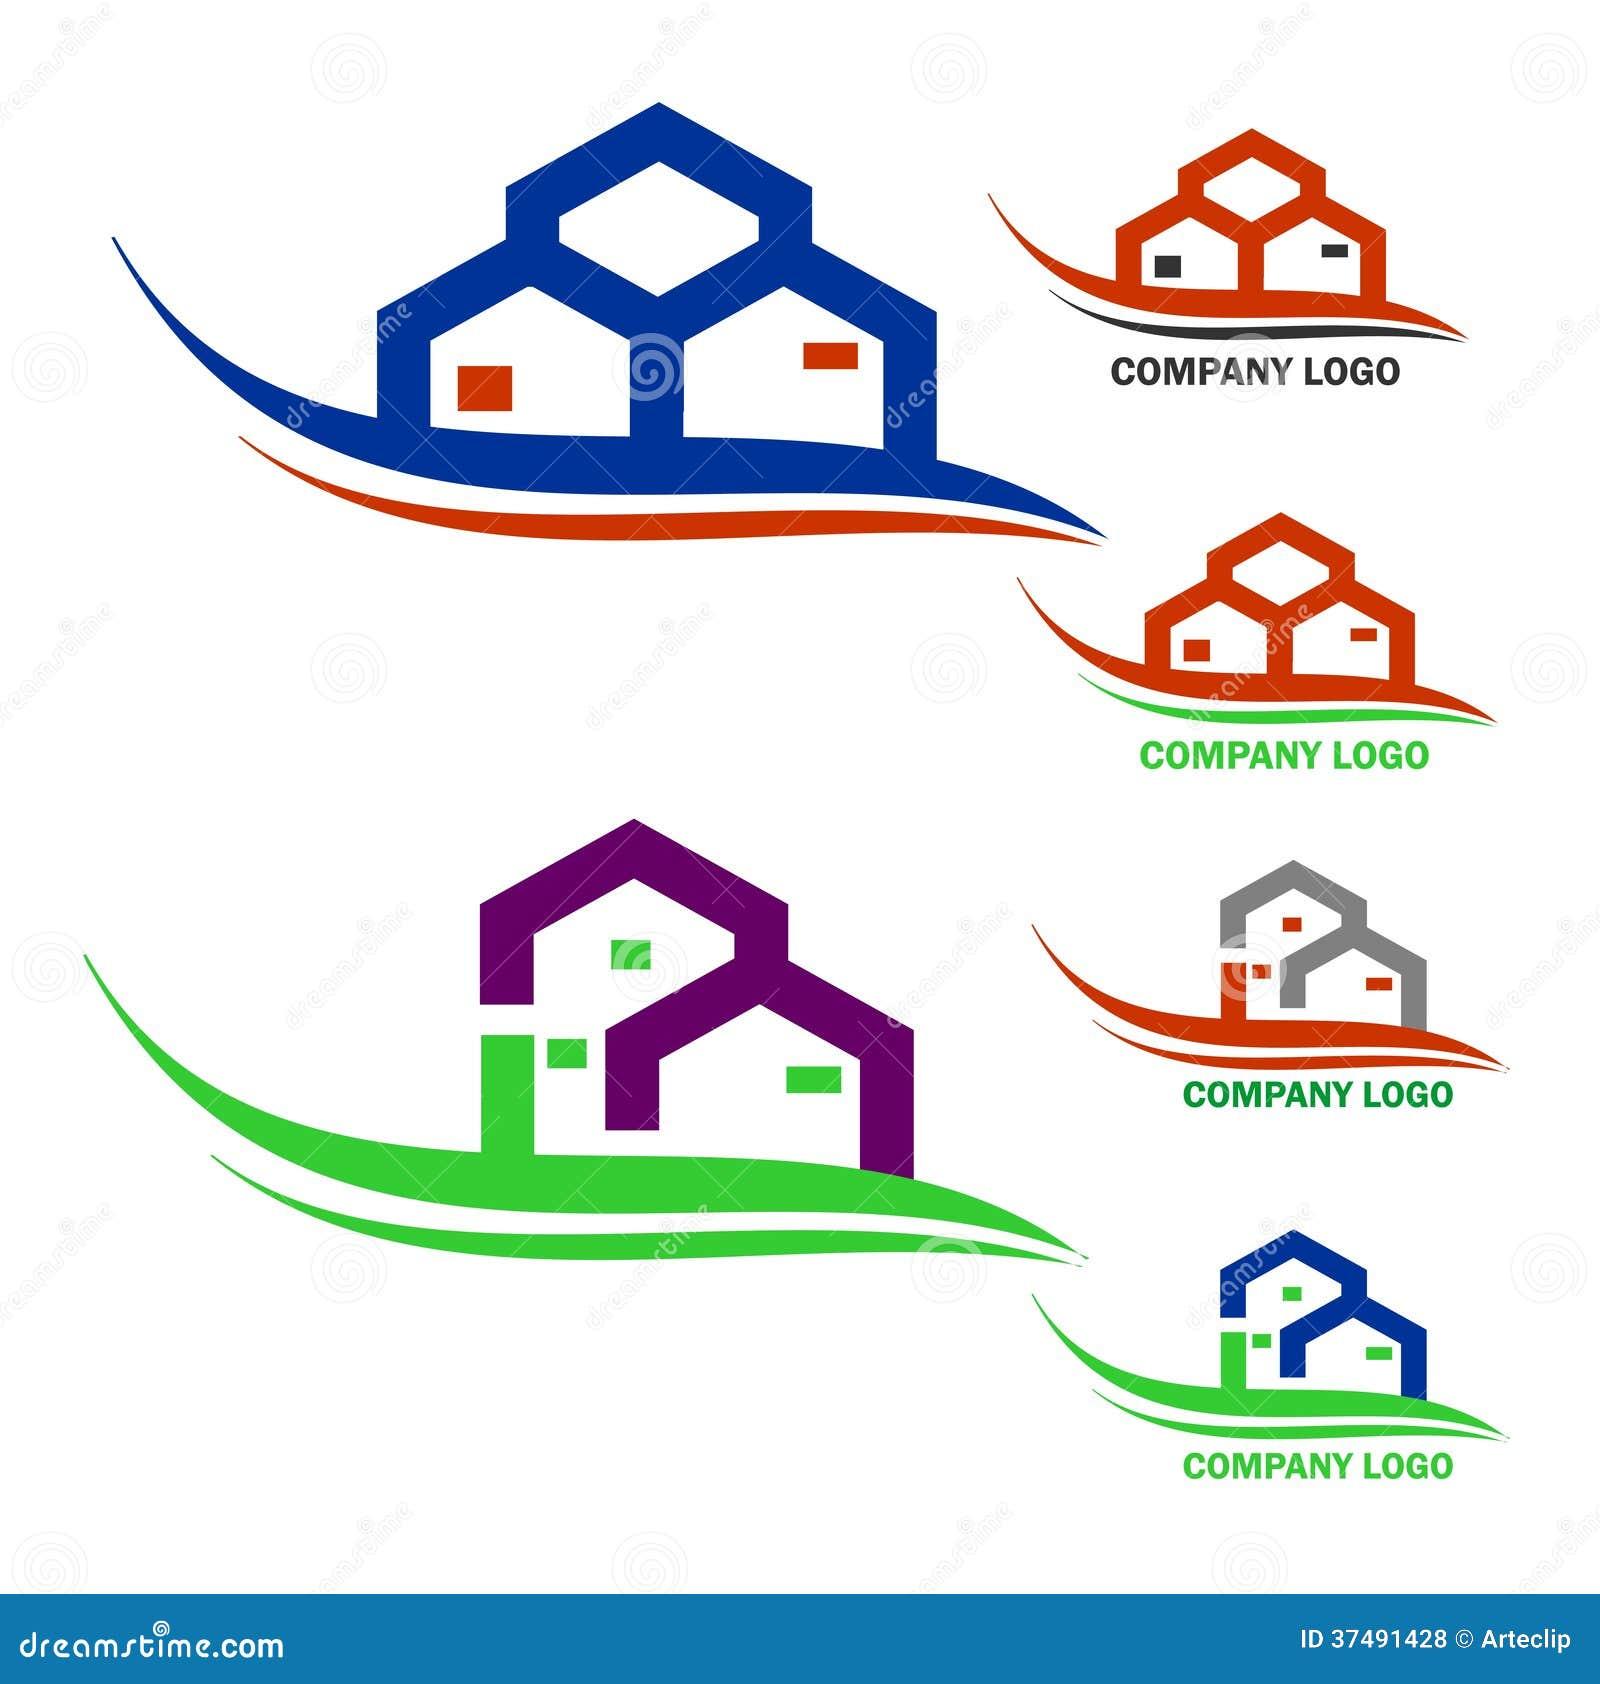 Real estate company logo royalty free stock photos image 37491428